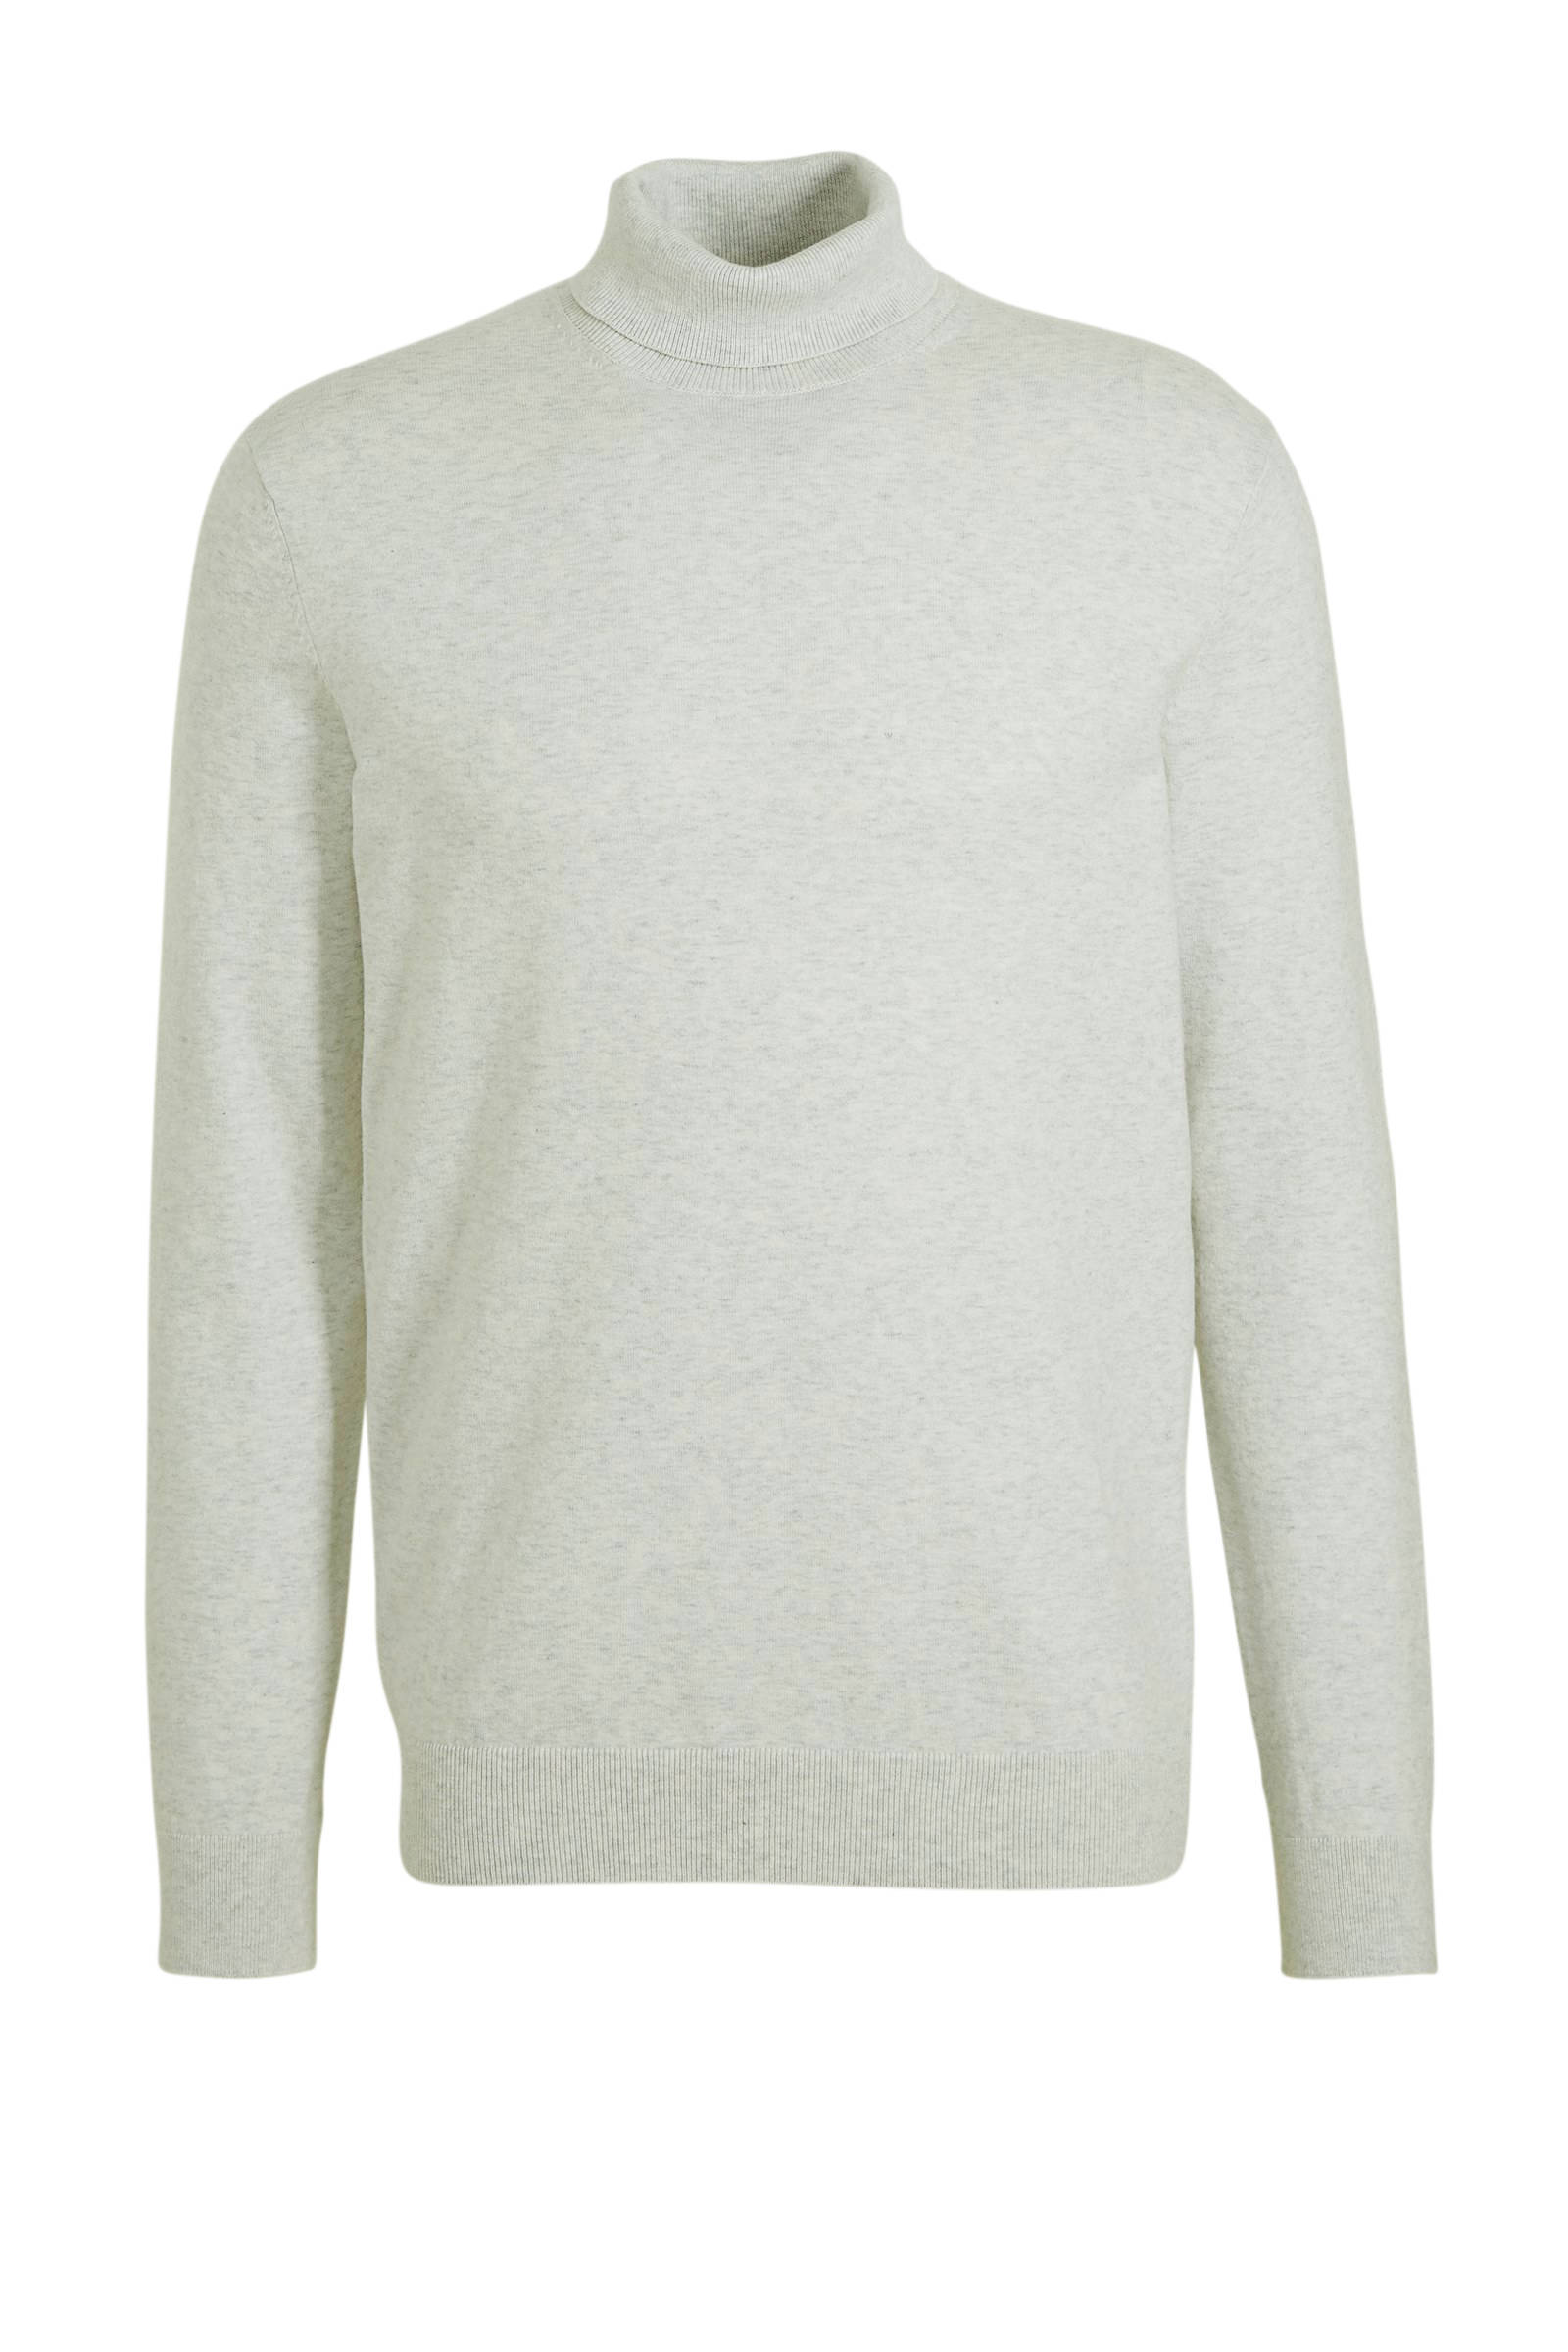 WE Fashion gemêleerde fijngebreide coltrui wit | wehkamp